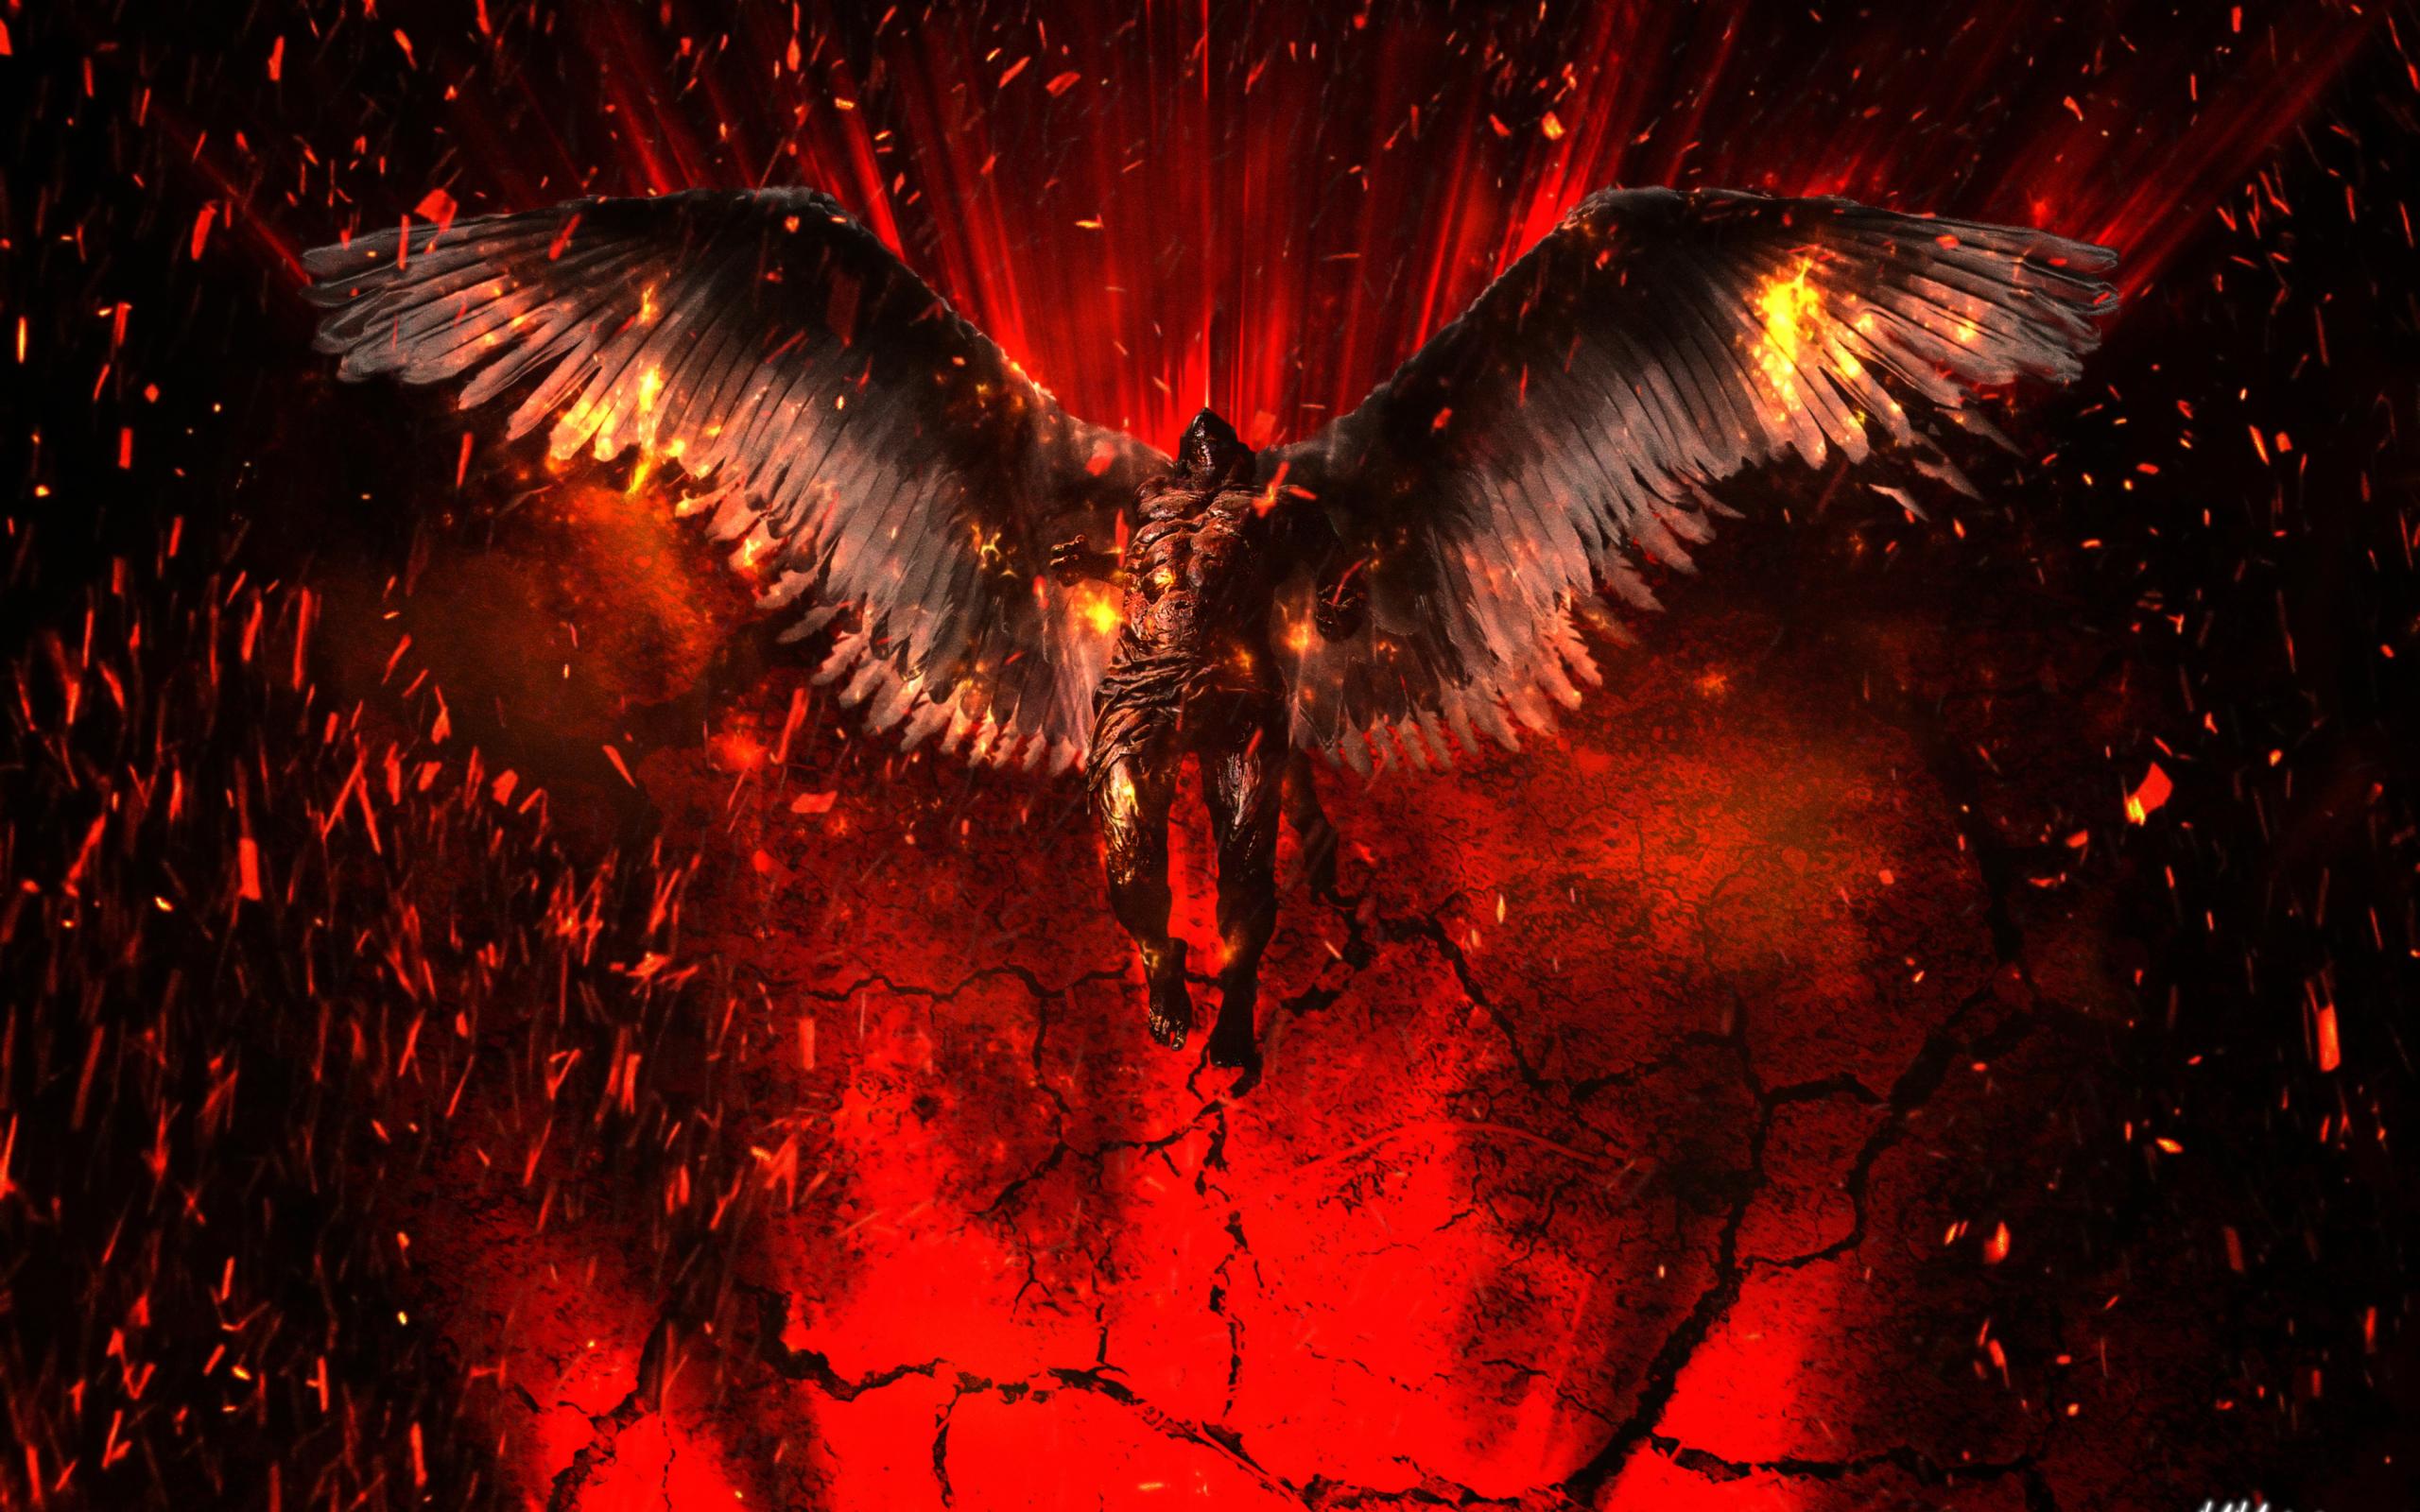 2560x1600 Lucifer 4K Artwork 2560x1600 Resolution ...